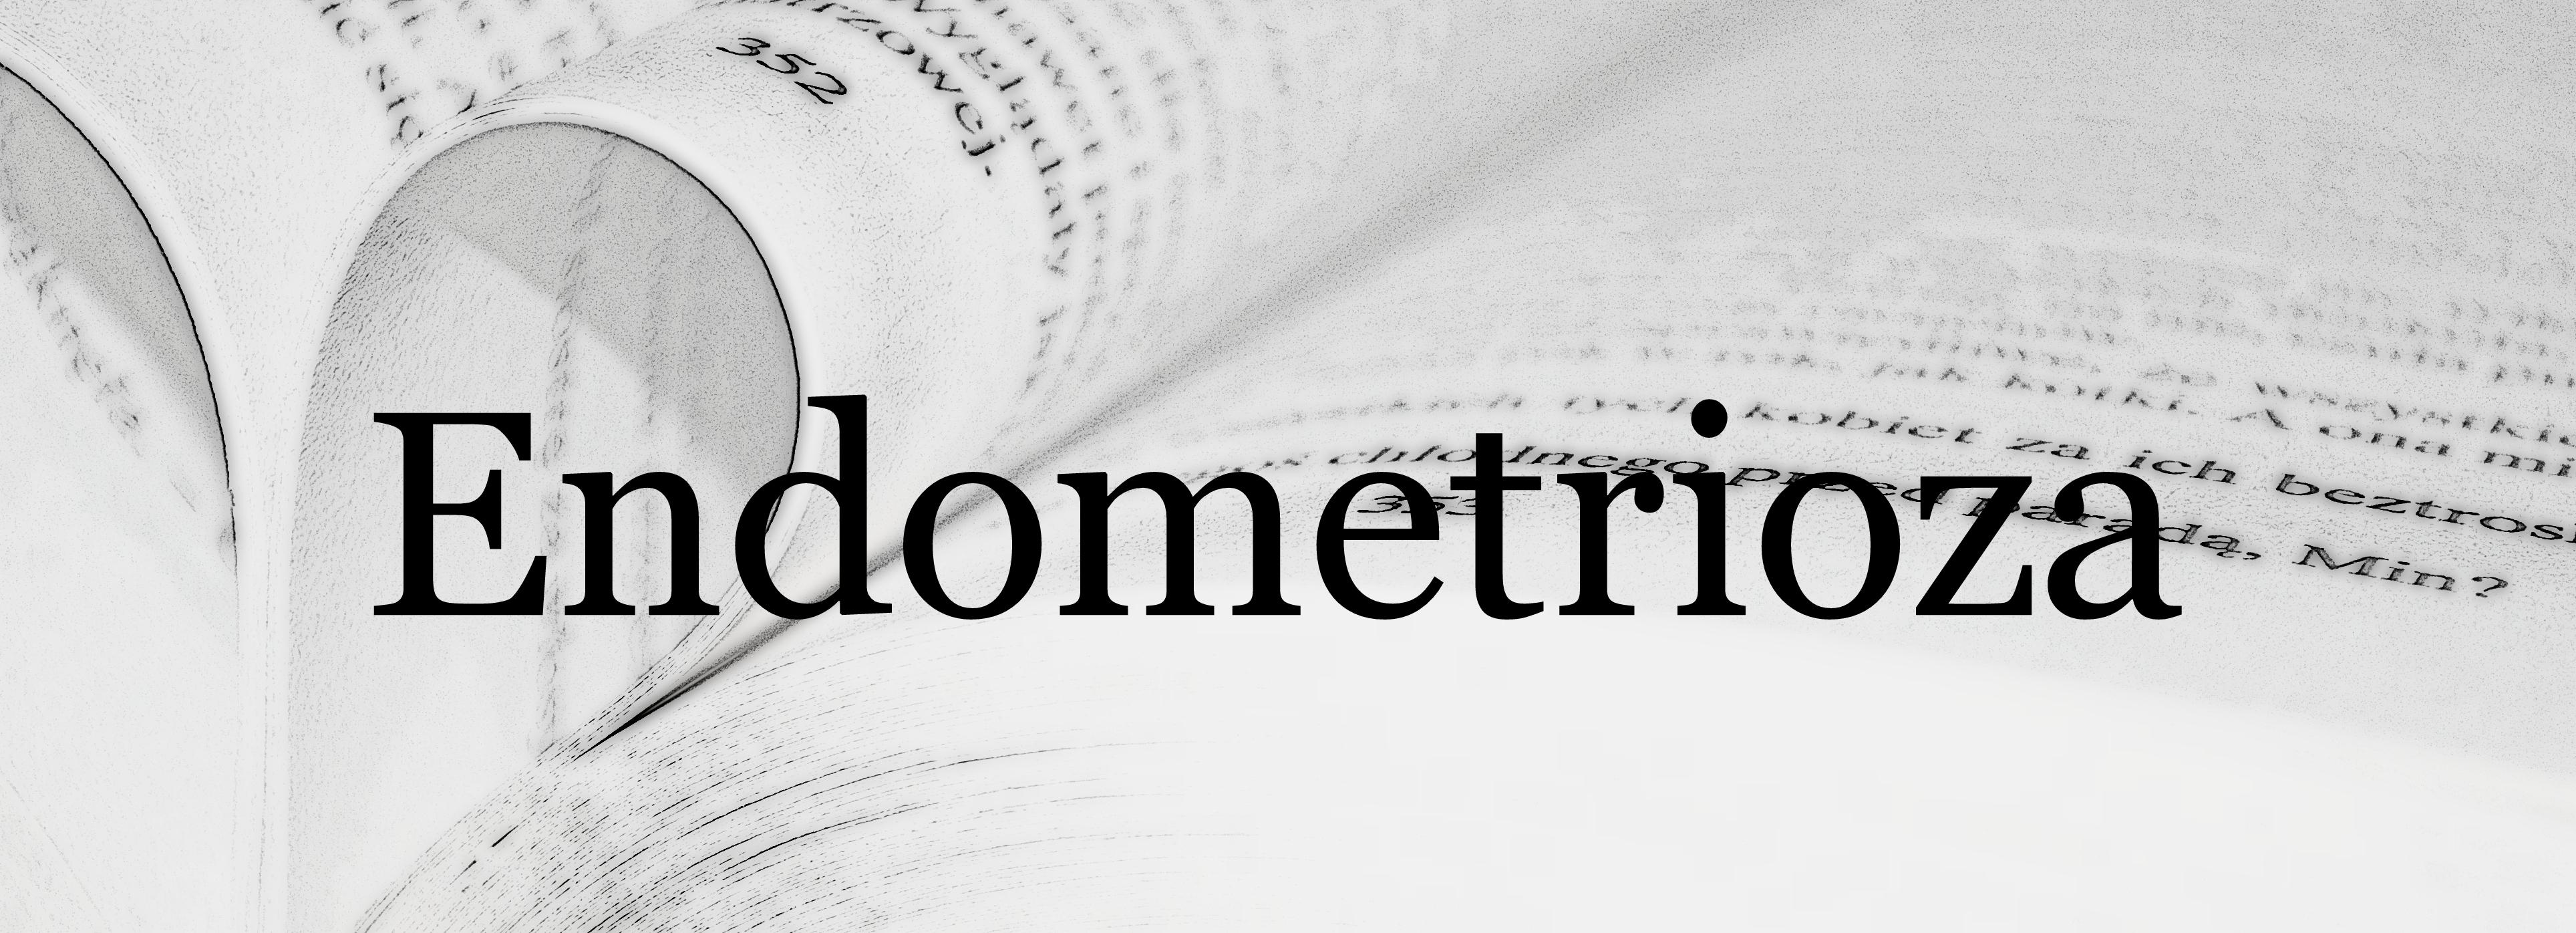 endometrioza-nie-jestes-sama